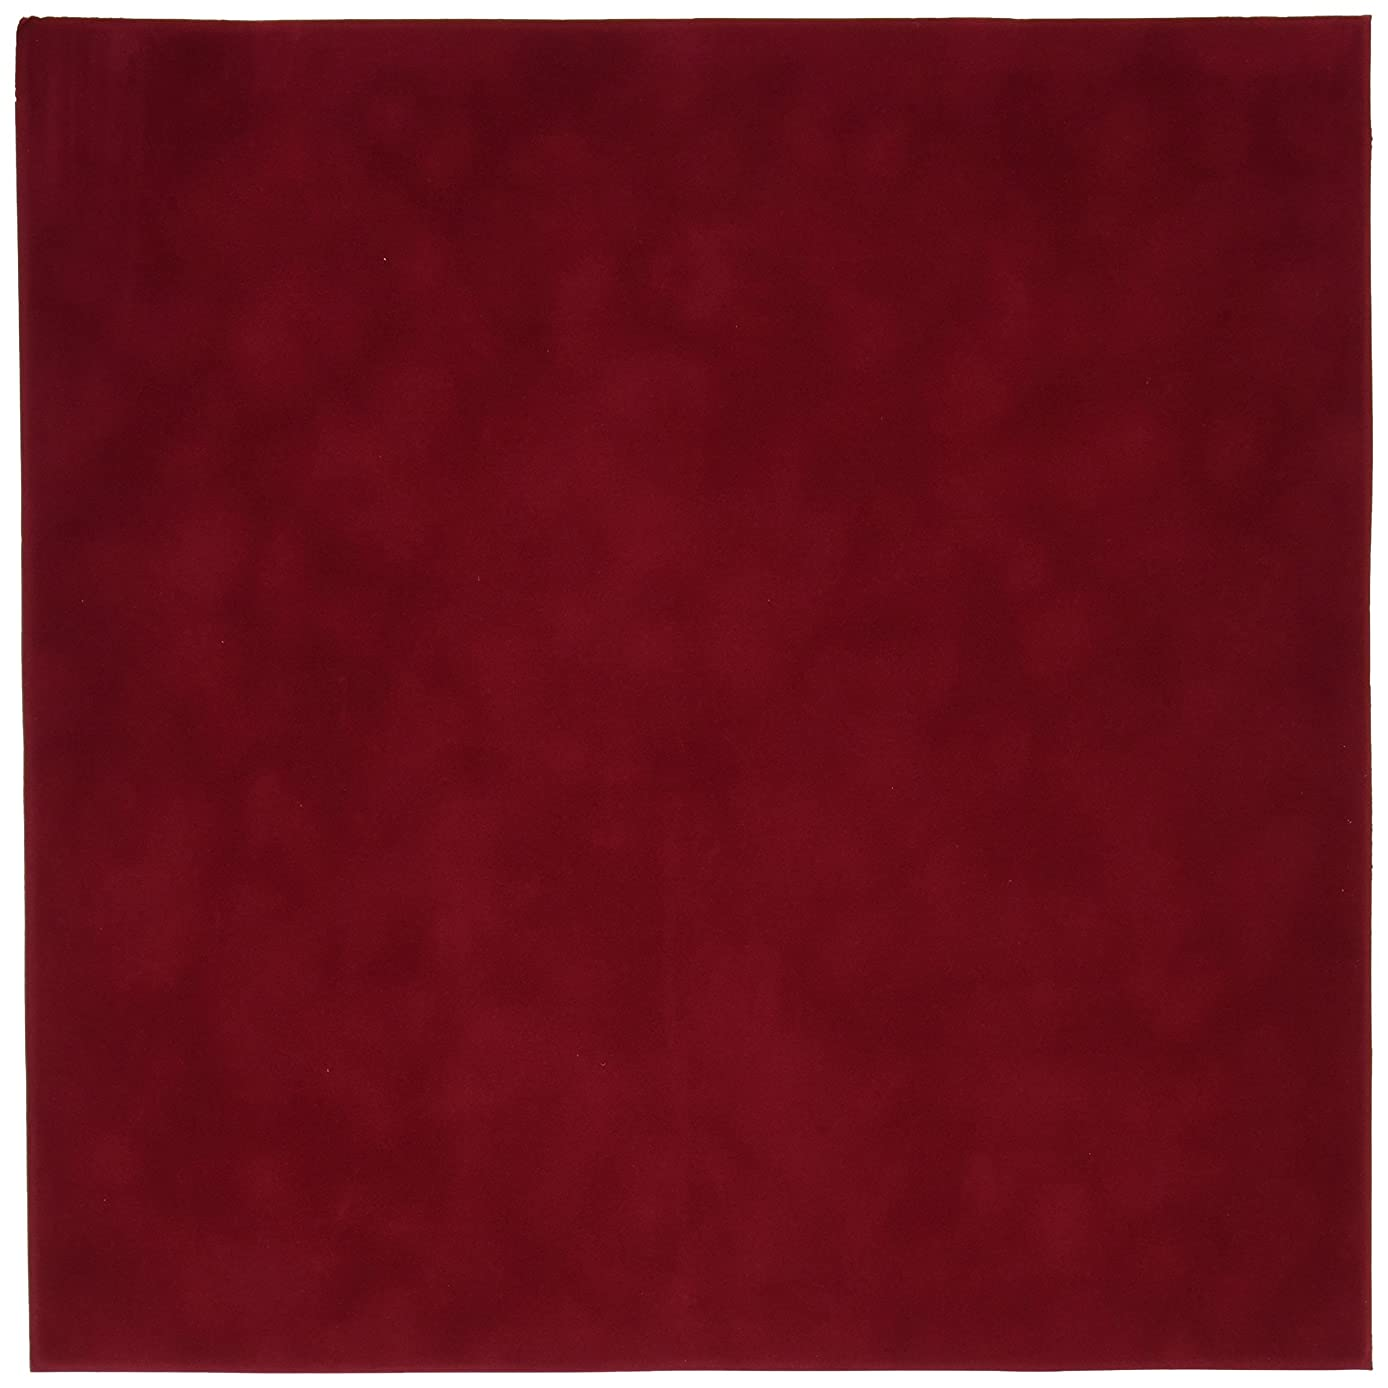 Sew Easy Industries 12-Sheet Velvet Paper, 12 by 12-Inch, Tomato